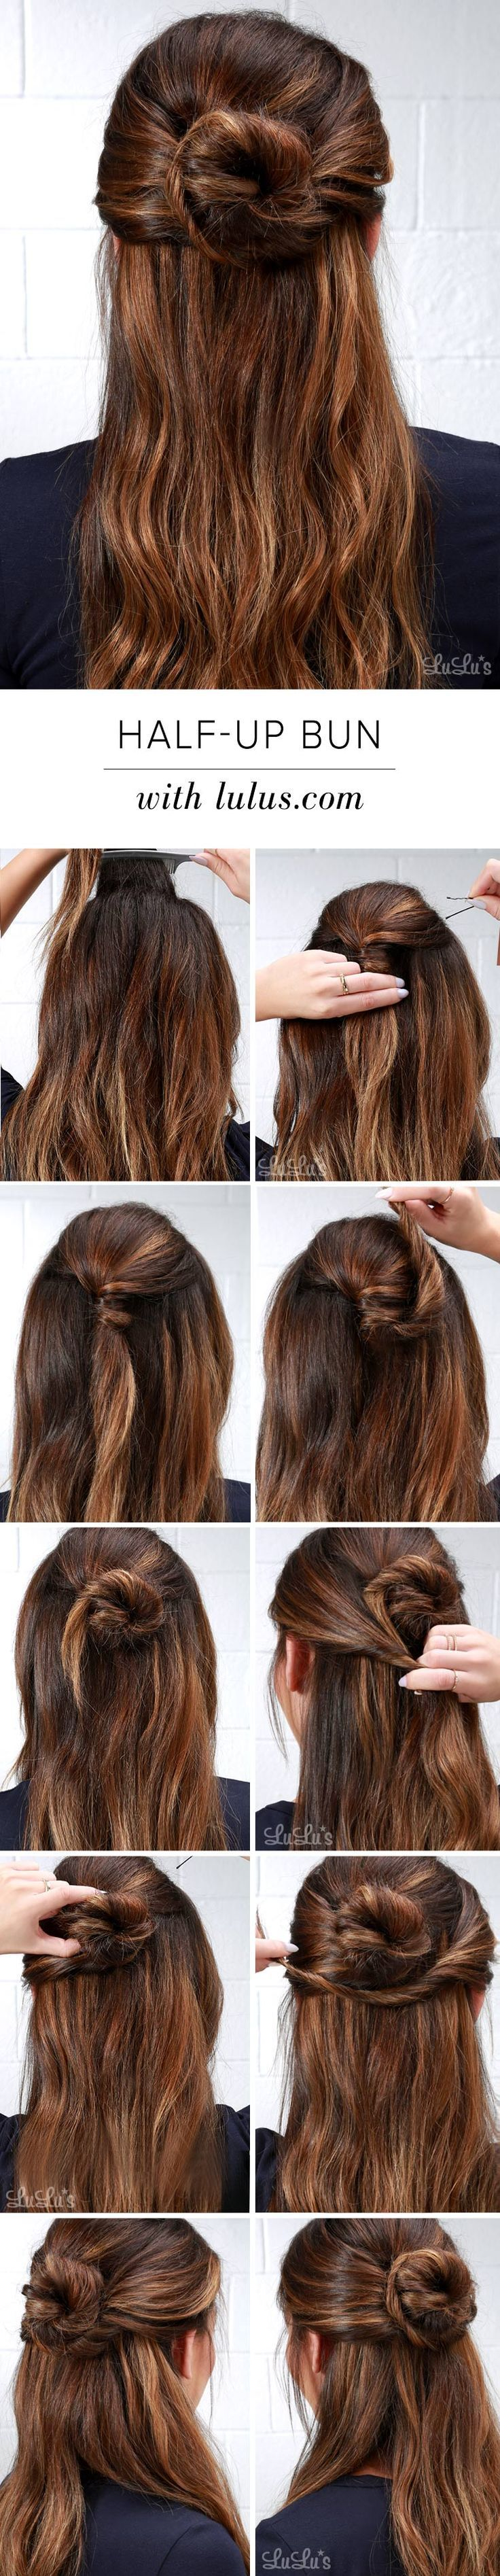 LuLu*s How-To: Half-Up Bun Hair Tutorial at http://LuLus.com!